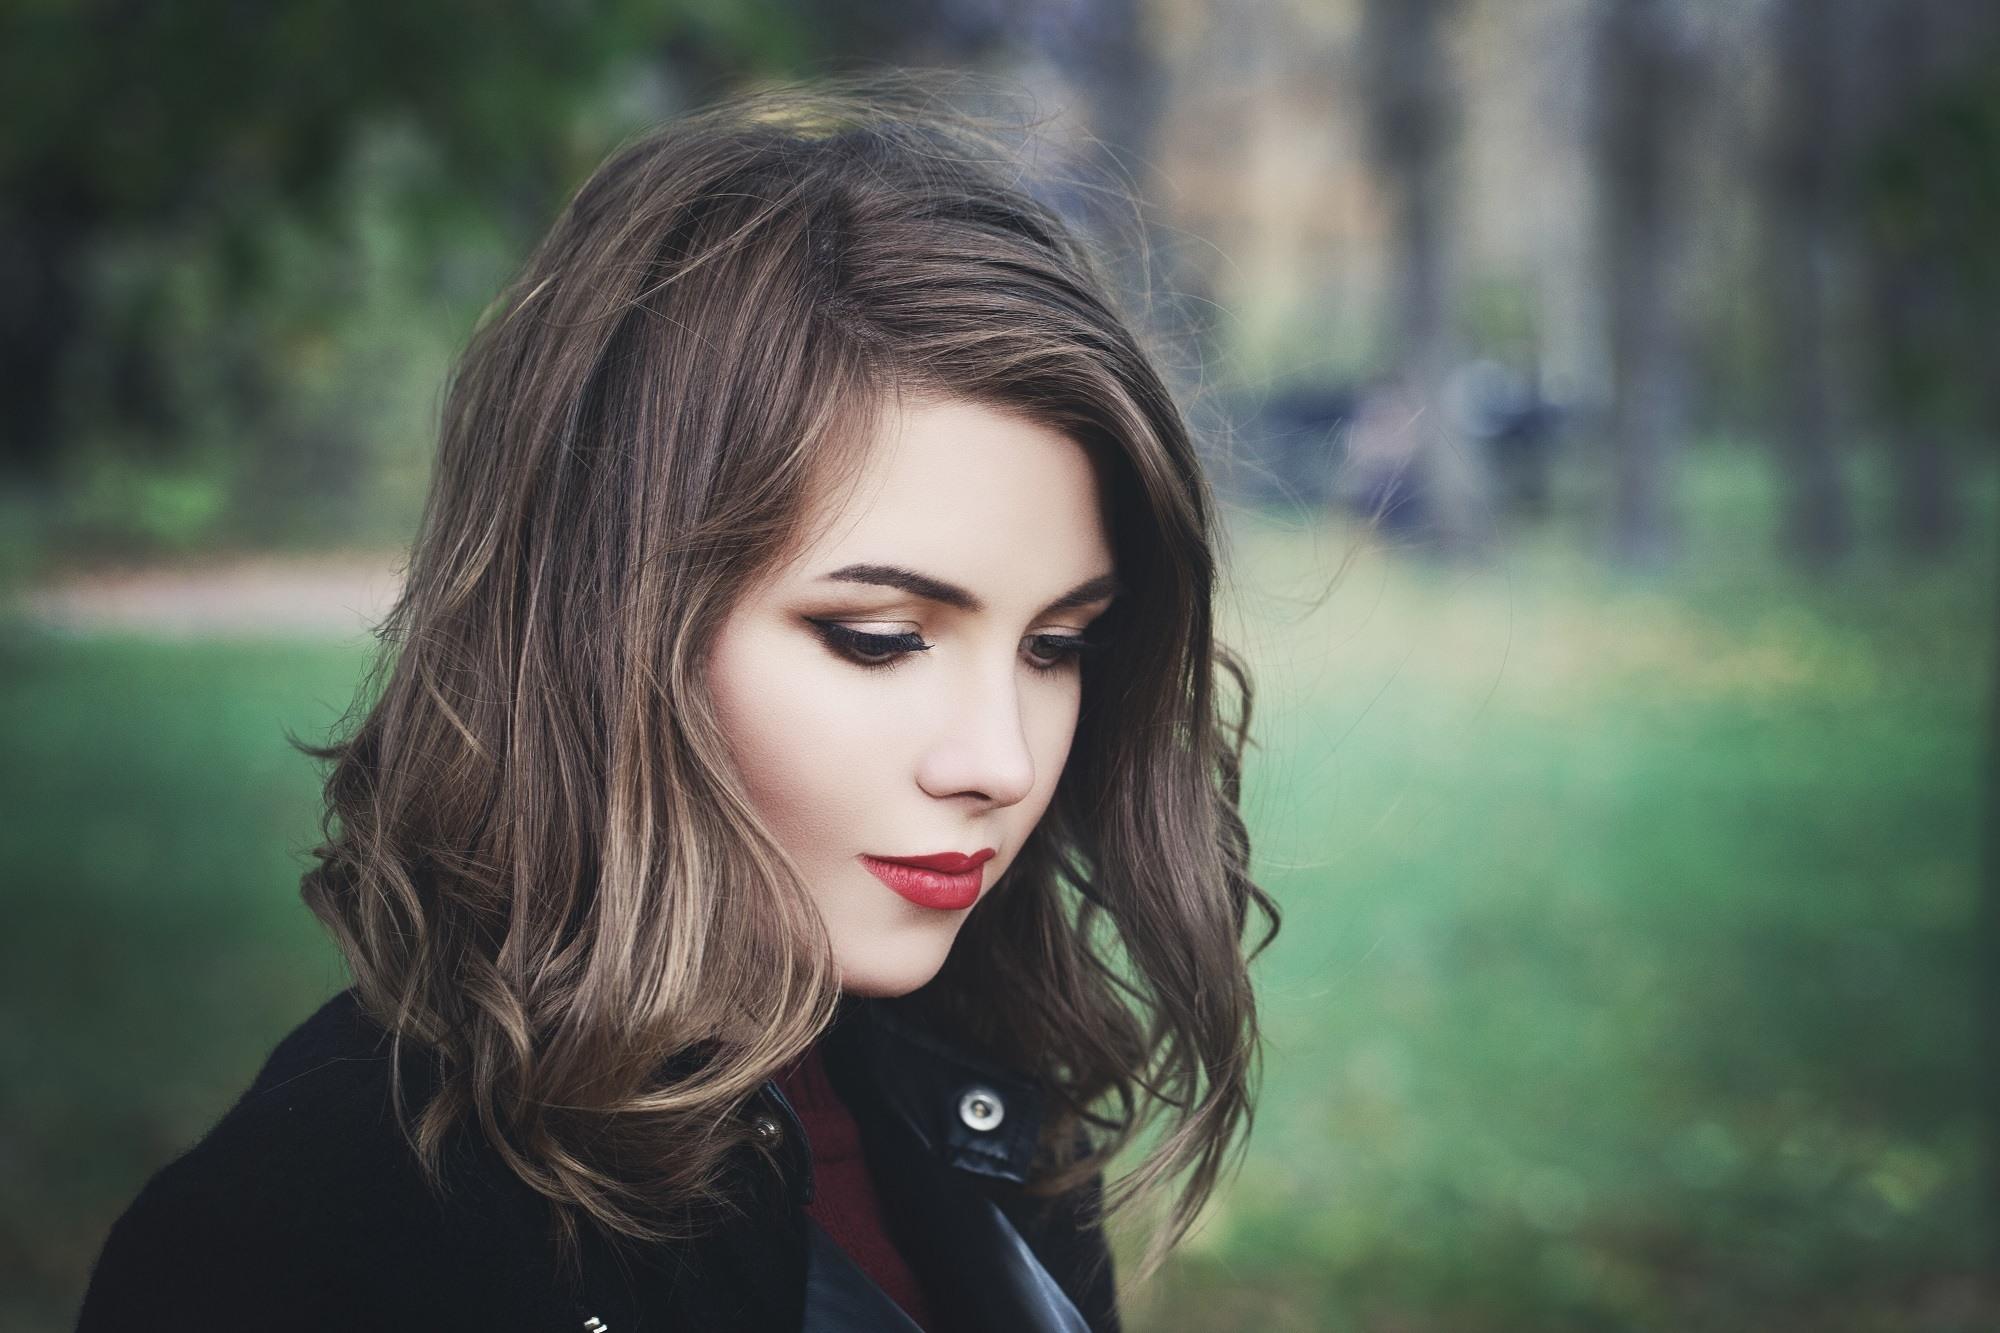 Lob hair ideas: Woman with brown wavy lob